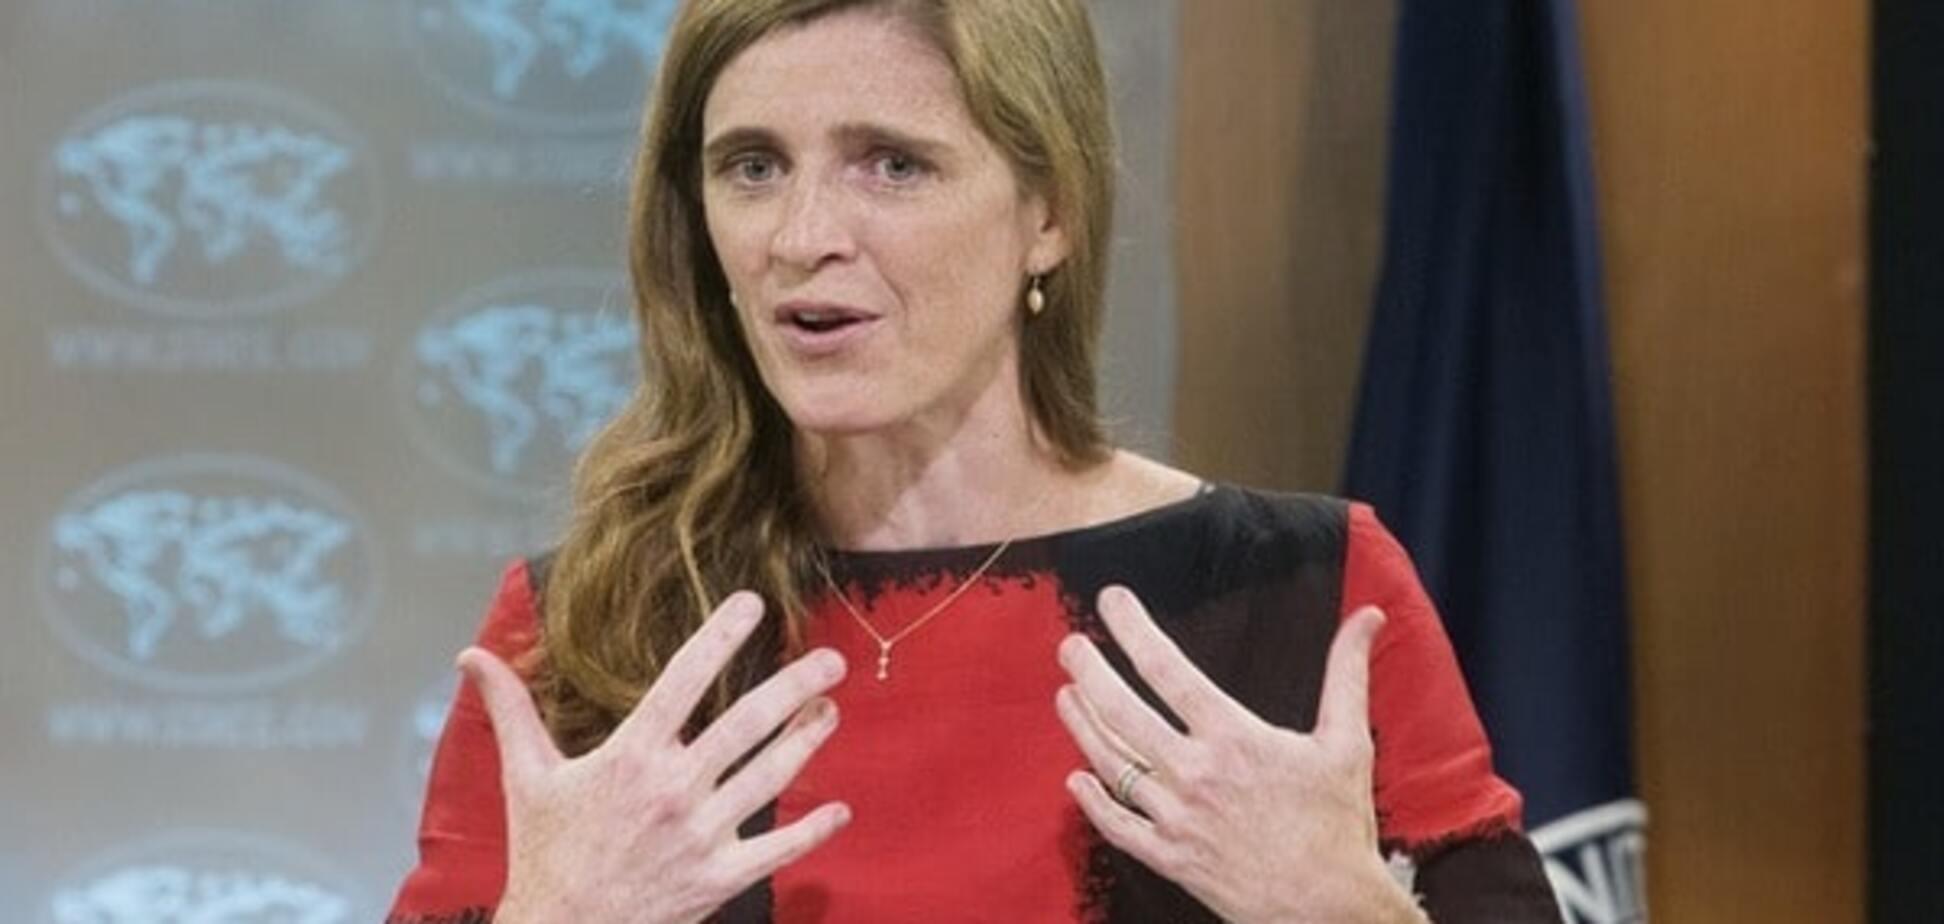 Кричуща неповага: посол США в ООН 'проїхалася' по Росії через Савченко